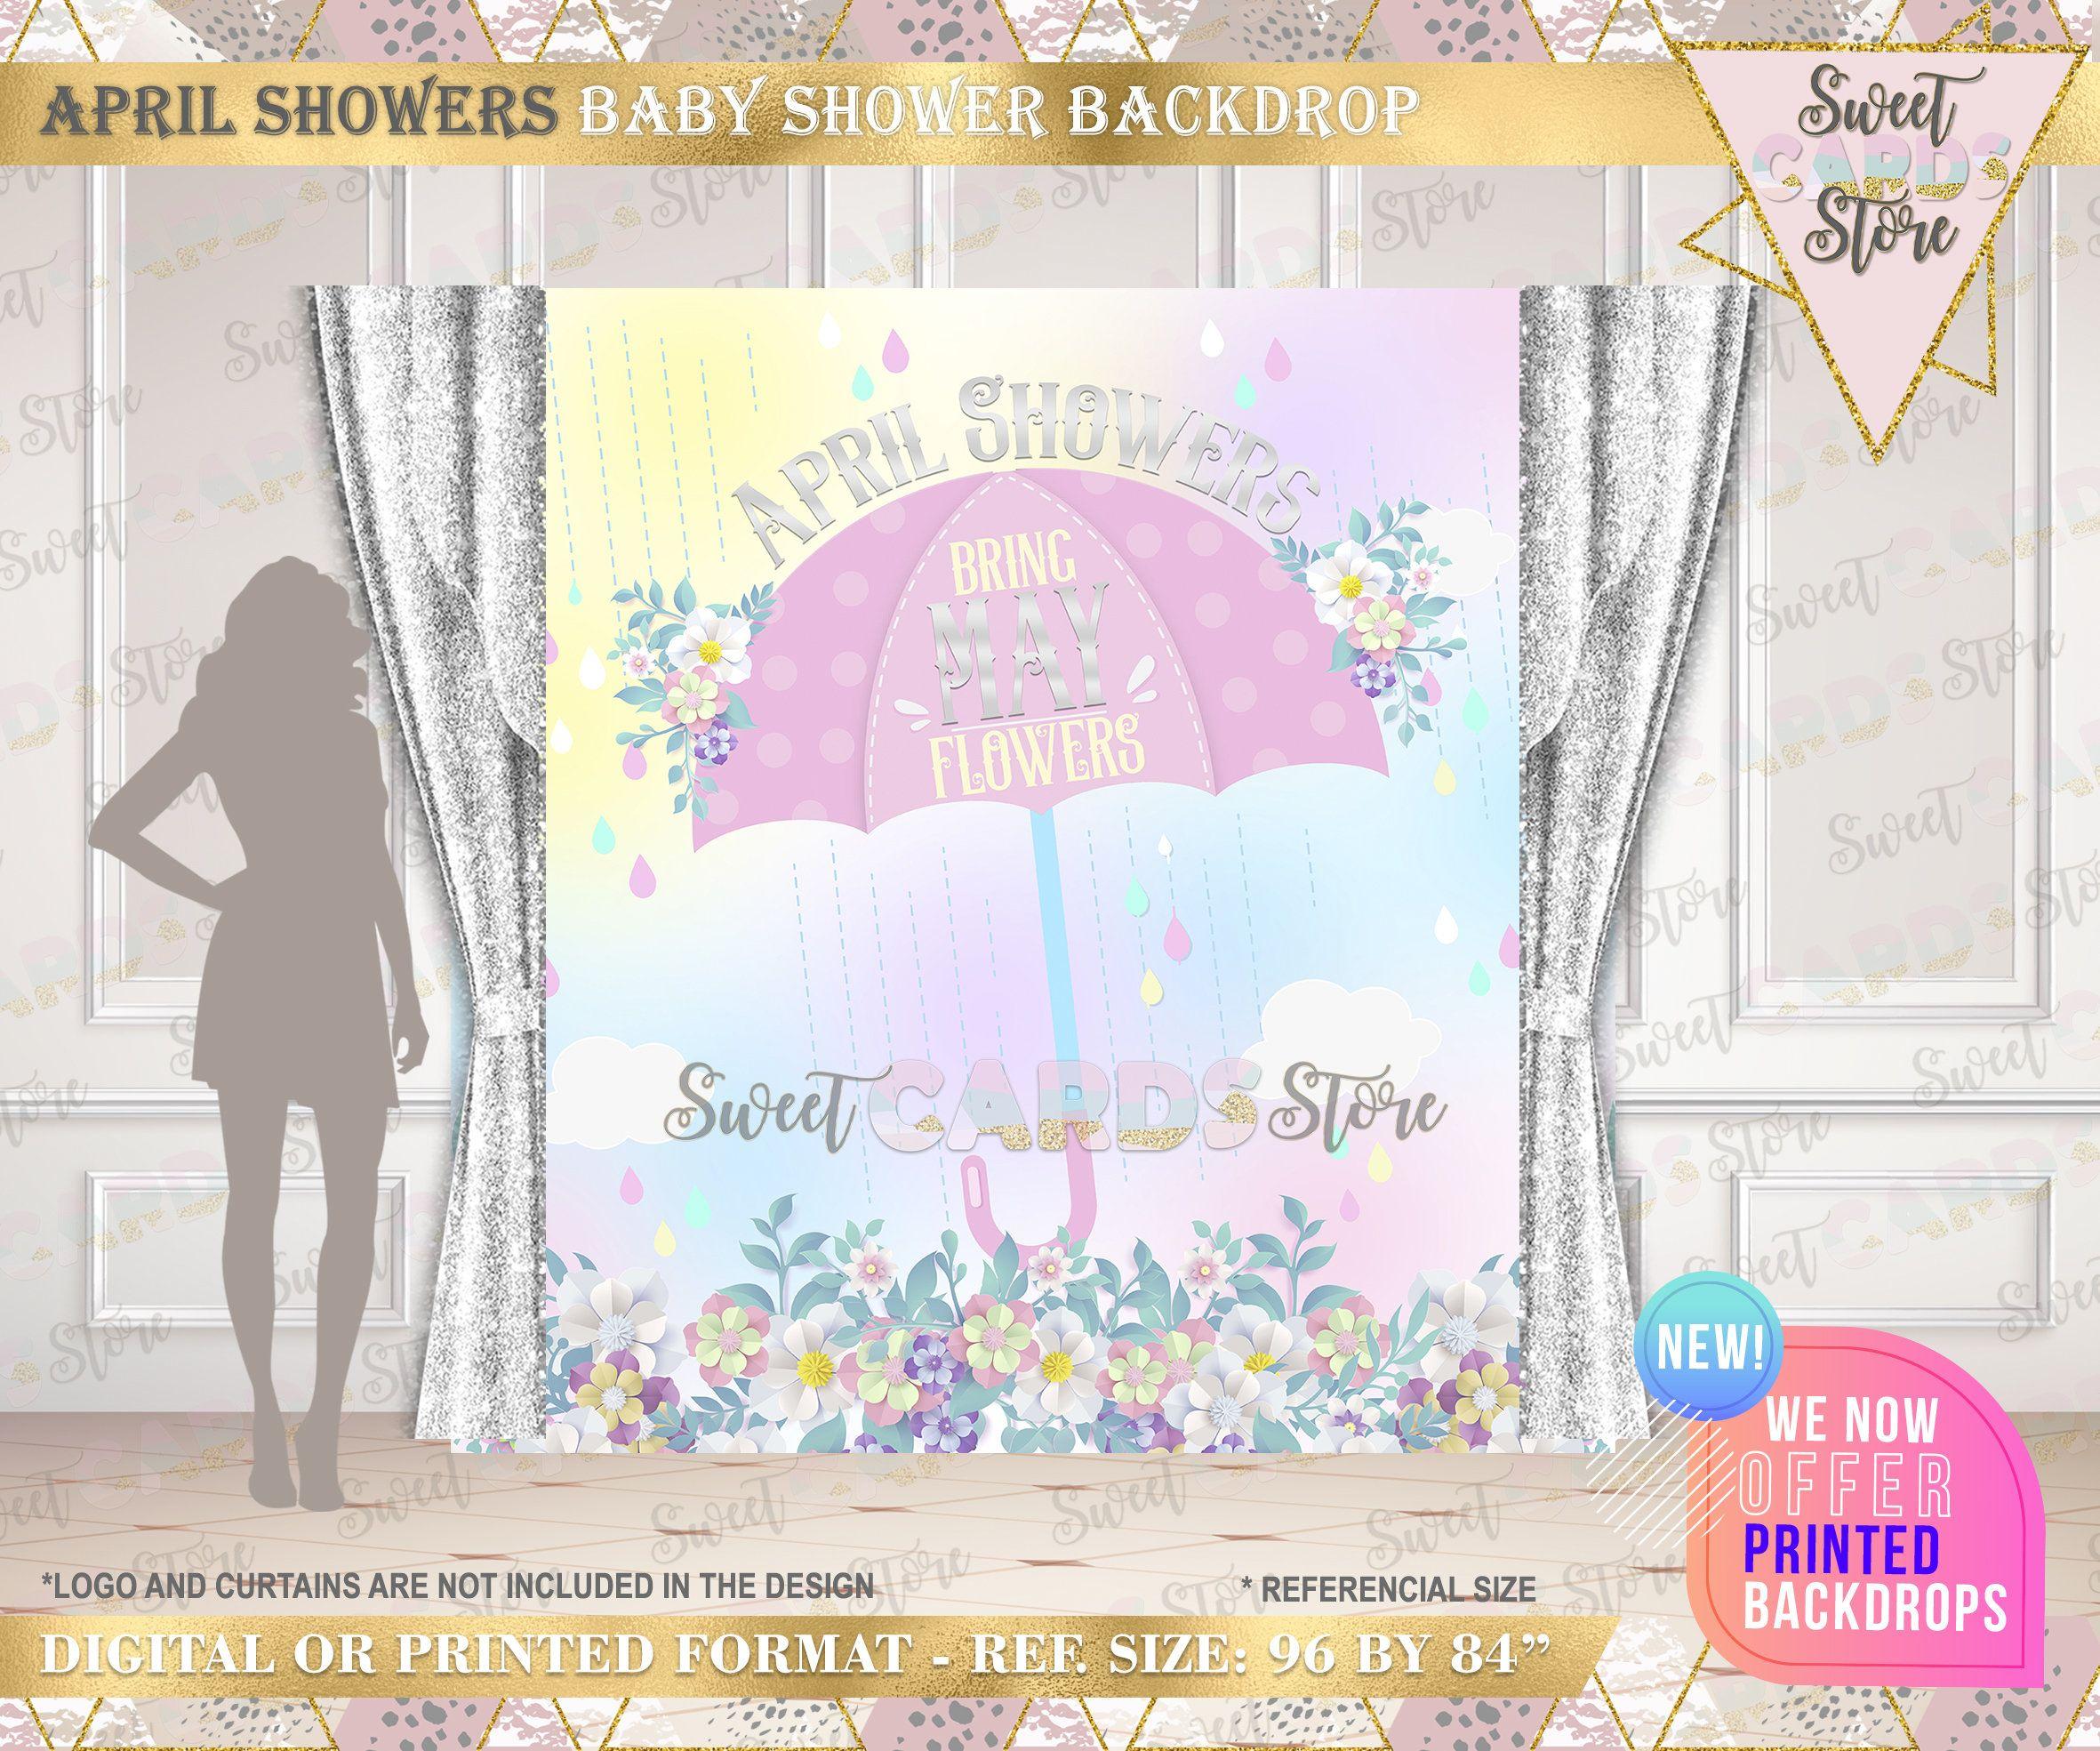 April Showers Floral Party Backdrop April Showers Baby Shower